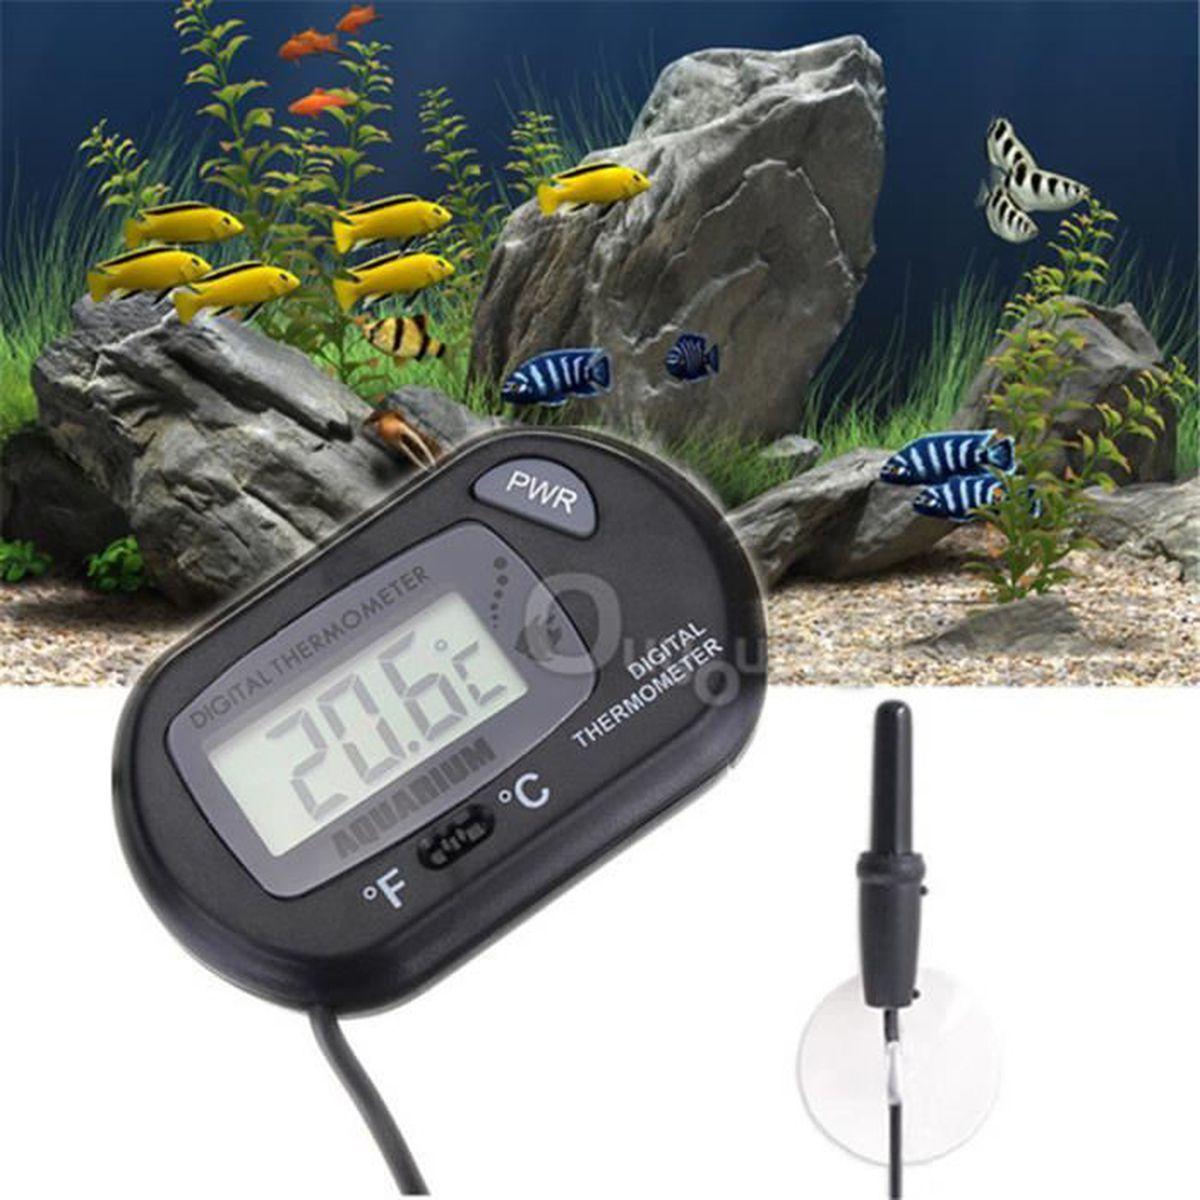 FACILLA/® LCD Thermom/ètre Thermometer Digital Pr/écision 1/°C pour Aquarium Poisson